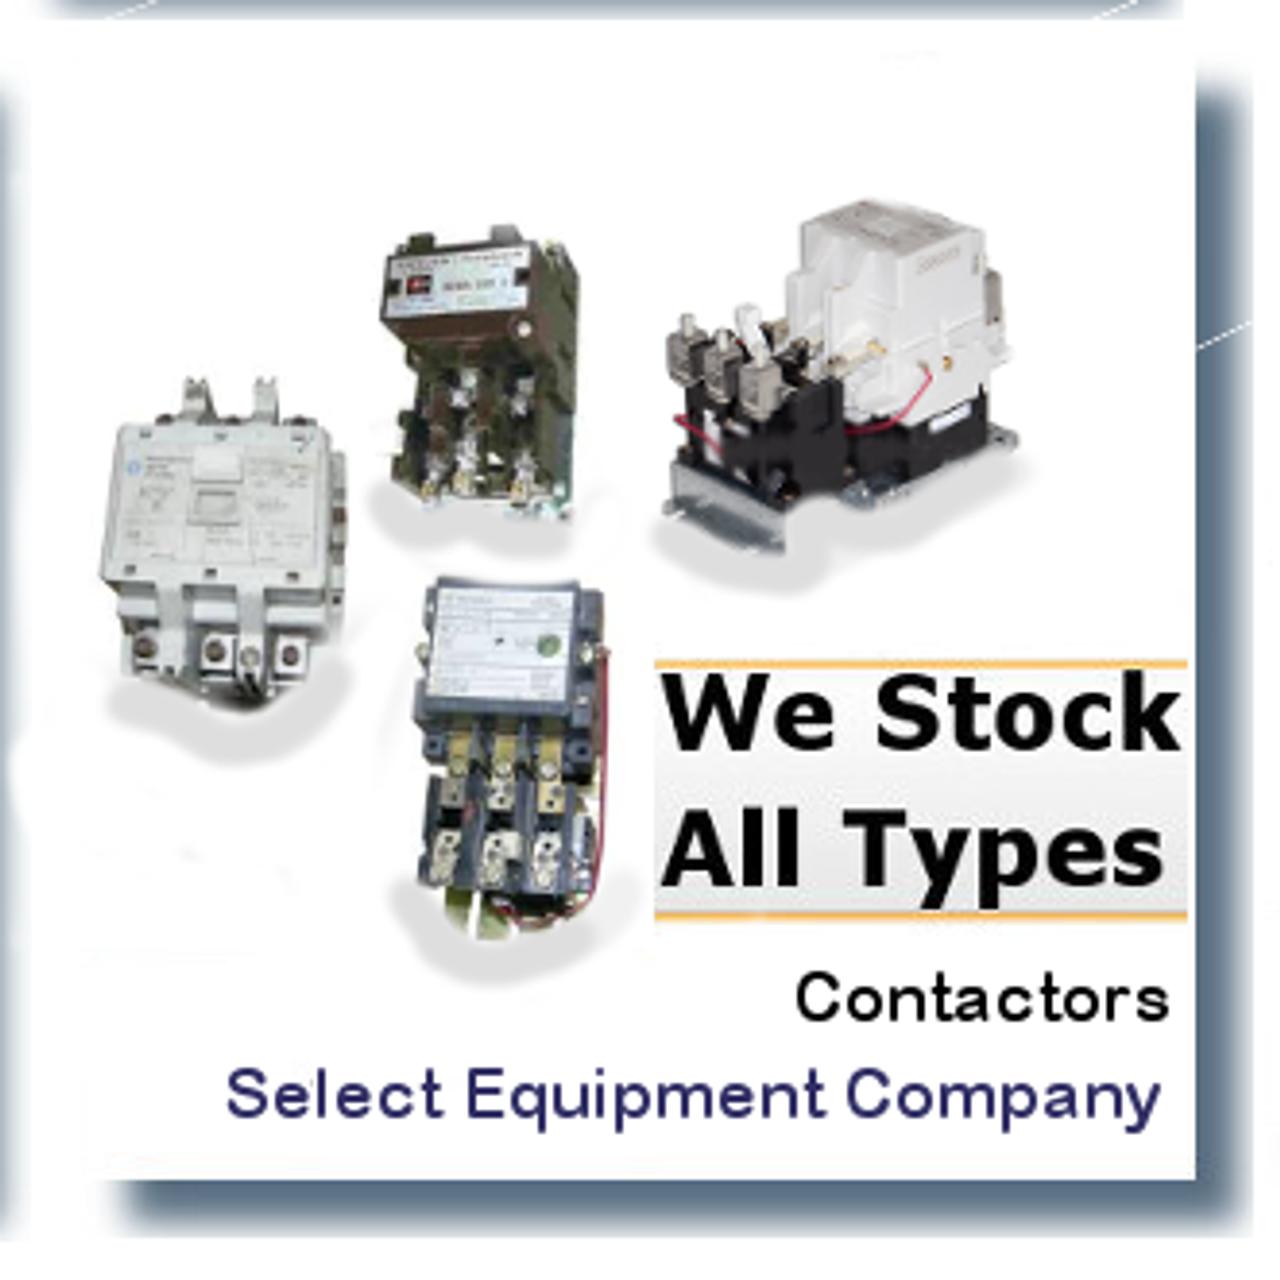 Mitsubishi Contactor | Non-Reversing Contactor | Select